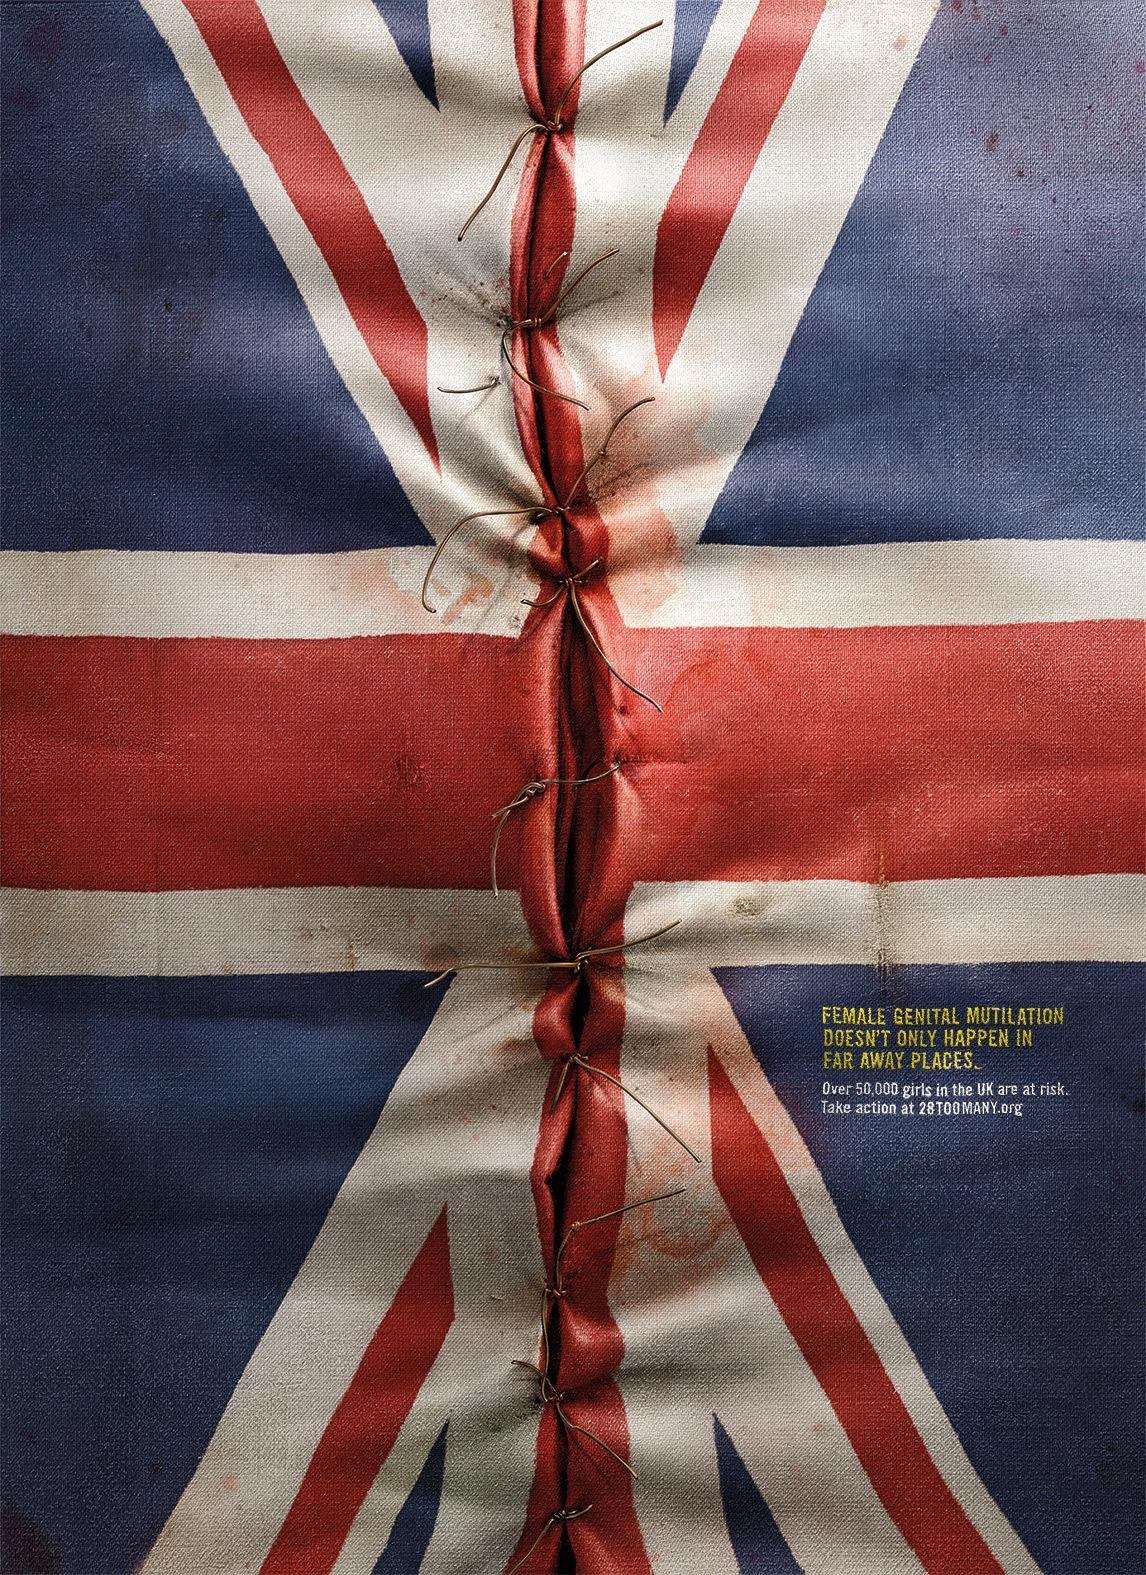 28-too-many-sweden-germany-italy-holland-uk-scotland-print-372439-adeevee